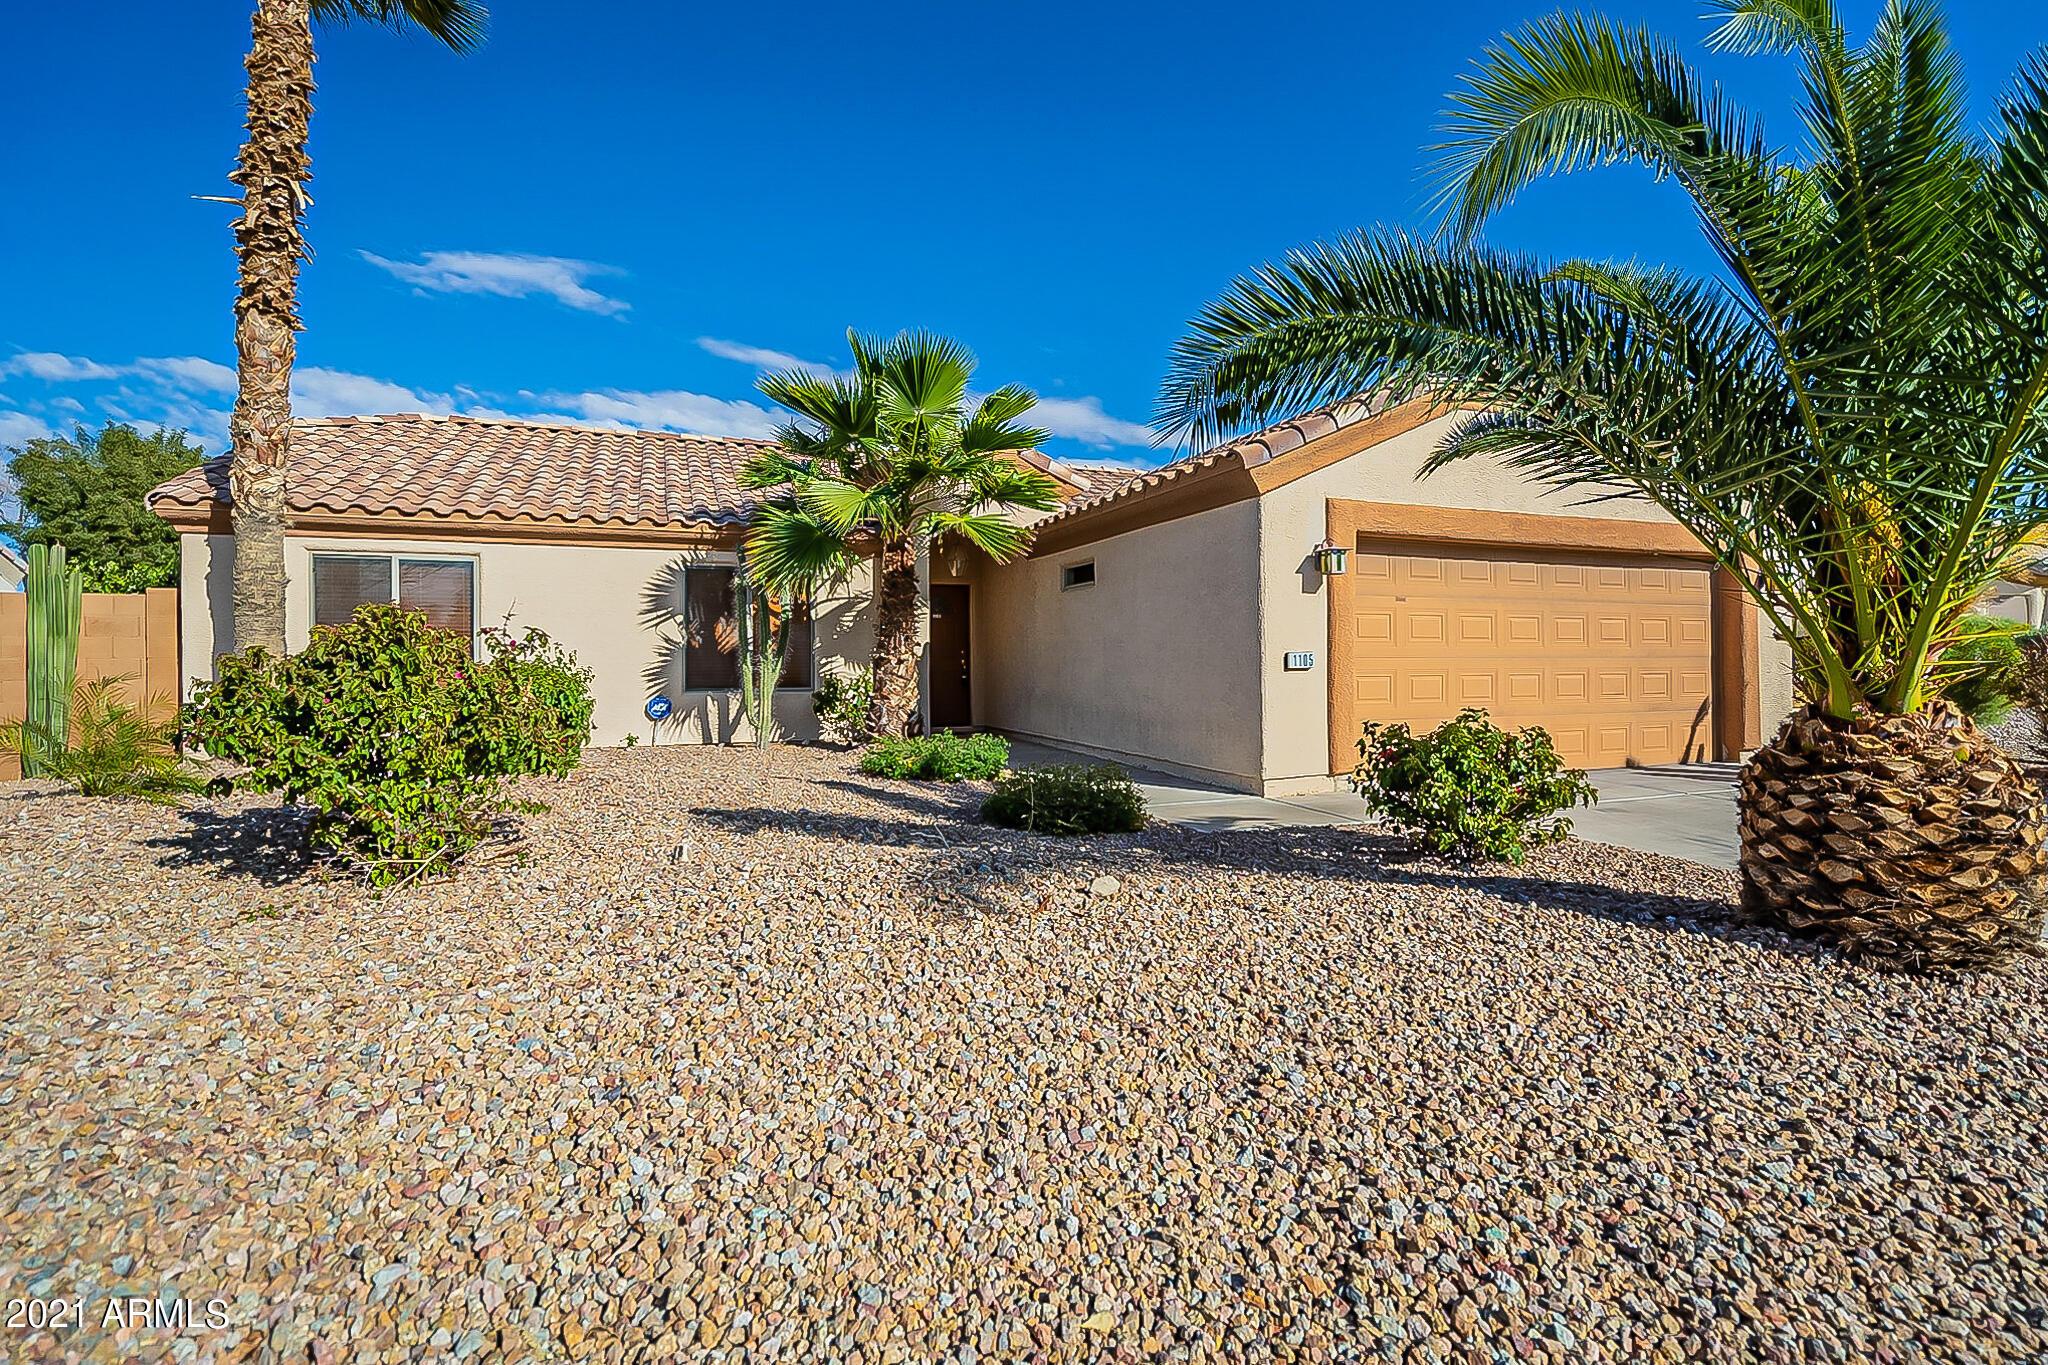 1105 N COTA Lane, Coolidge, AZ 85128, 3 Bedrooms Bedrooms, ,Residential Lease,For Rent,1105 N COTA Lane,5704805